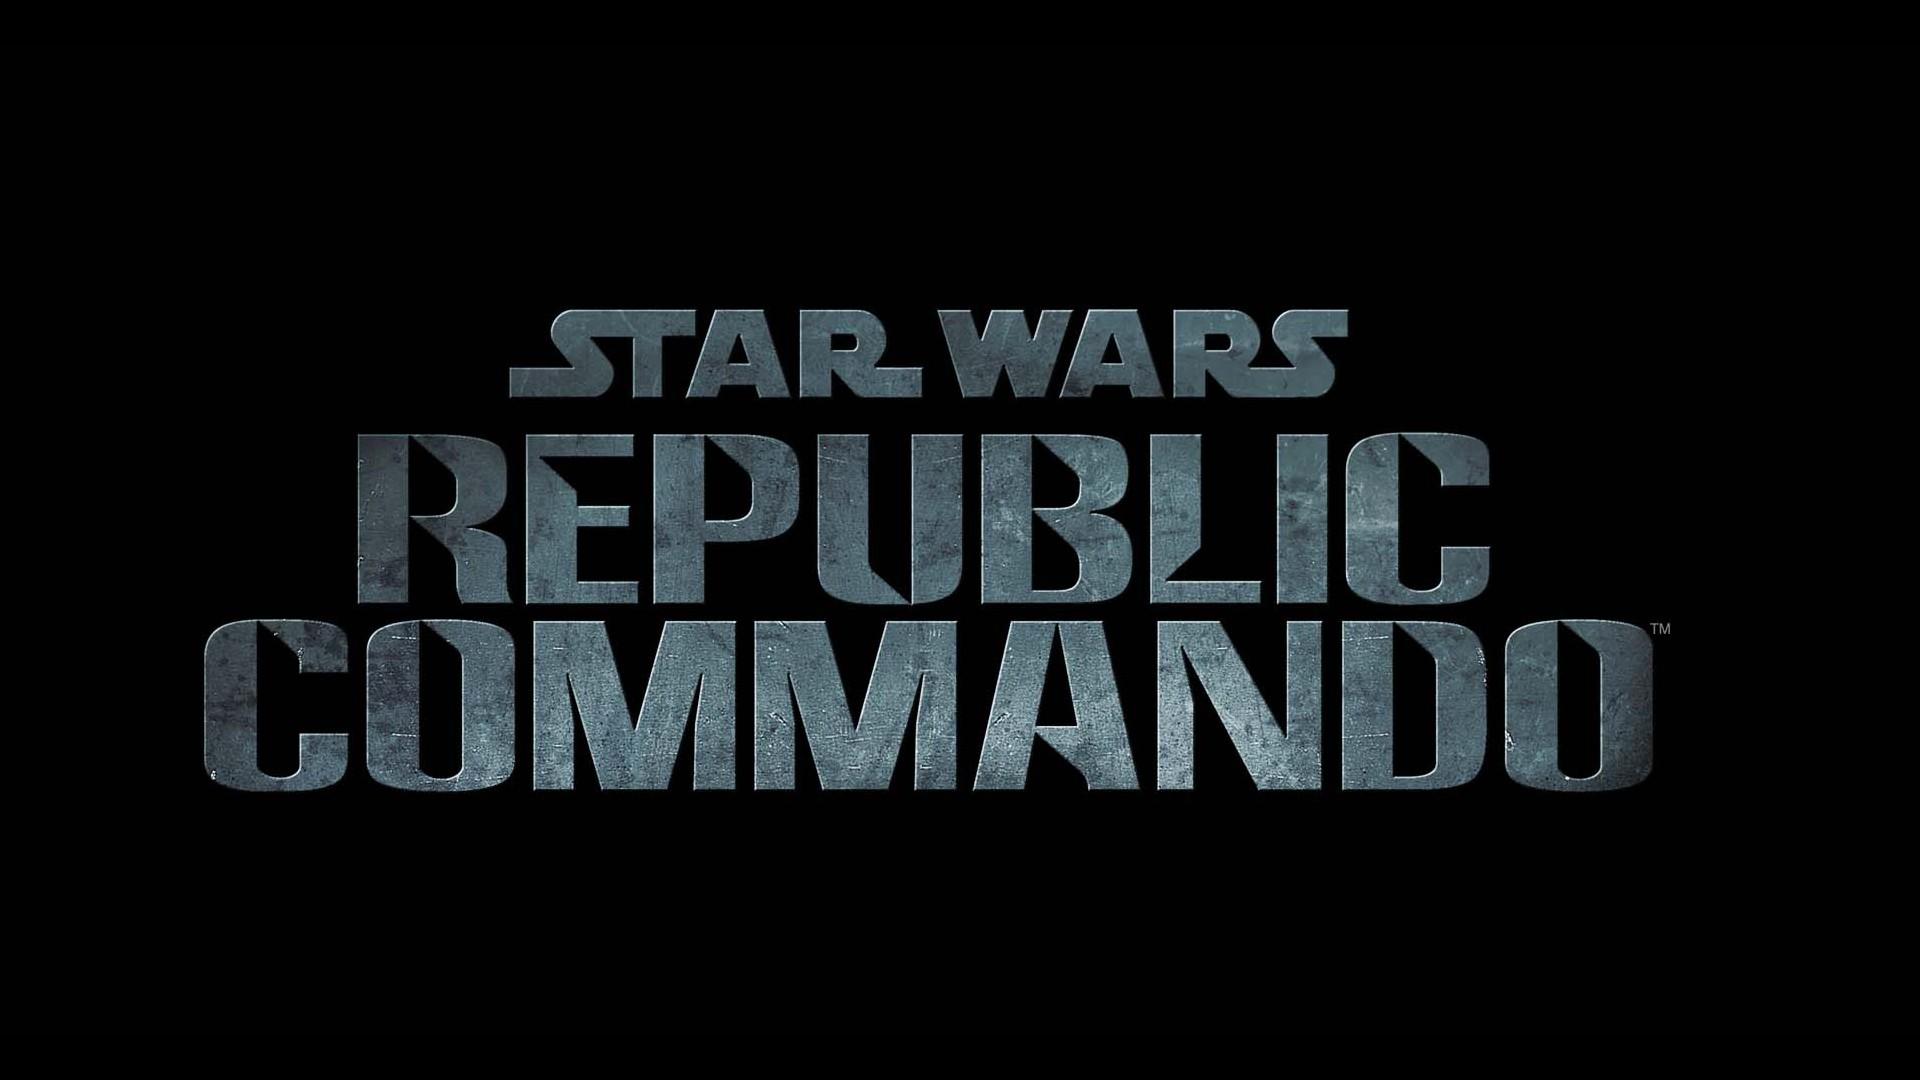 Star wars republic commando logopedia fandom powered - Republic star wars logo ...